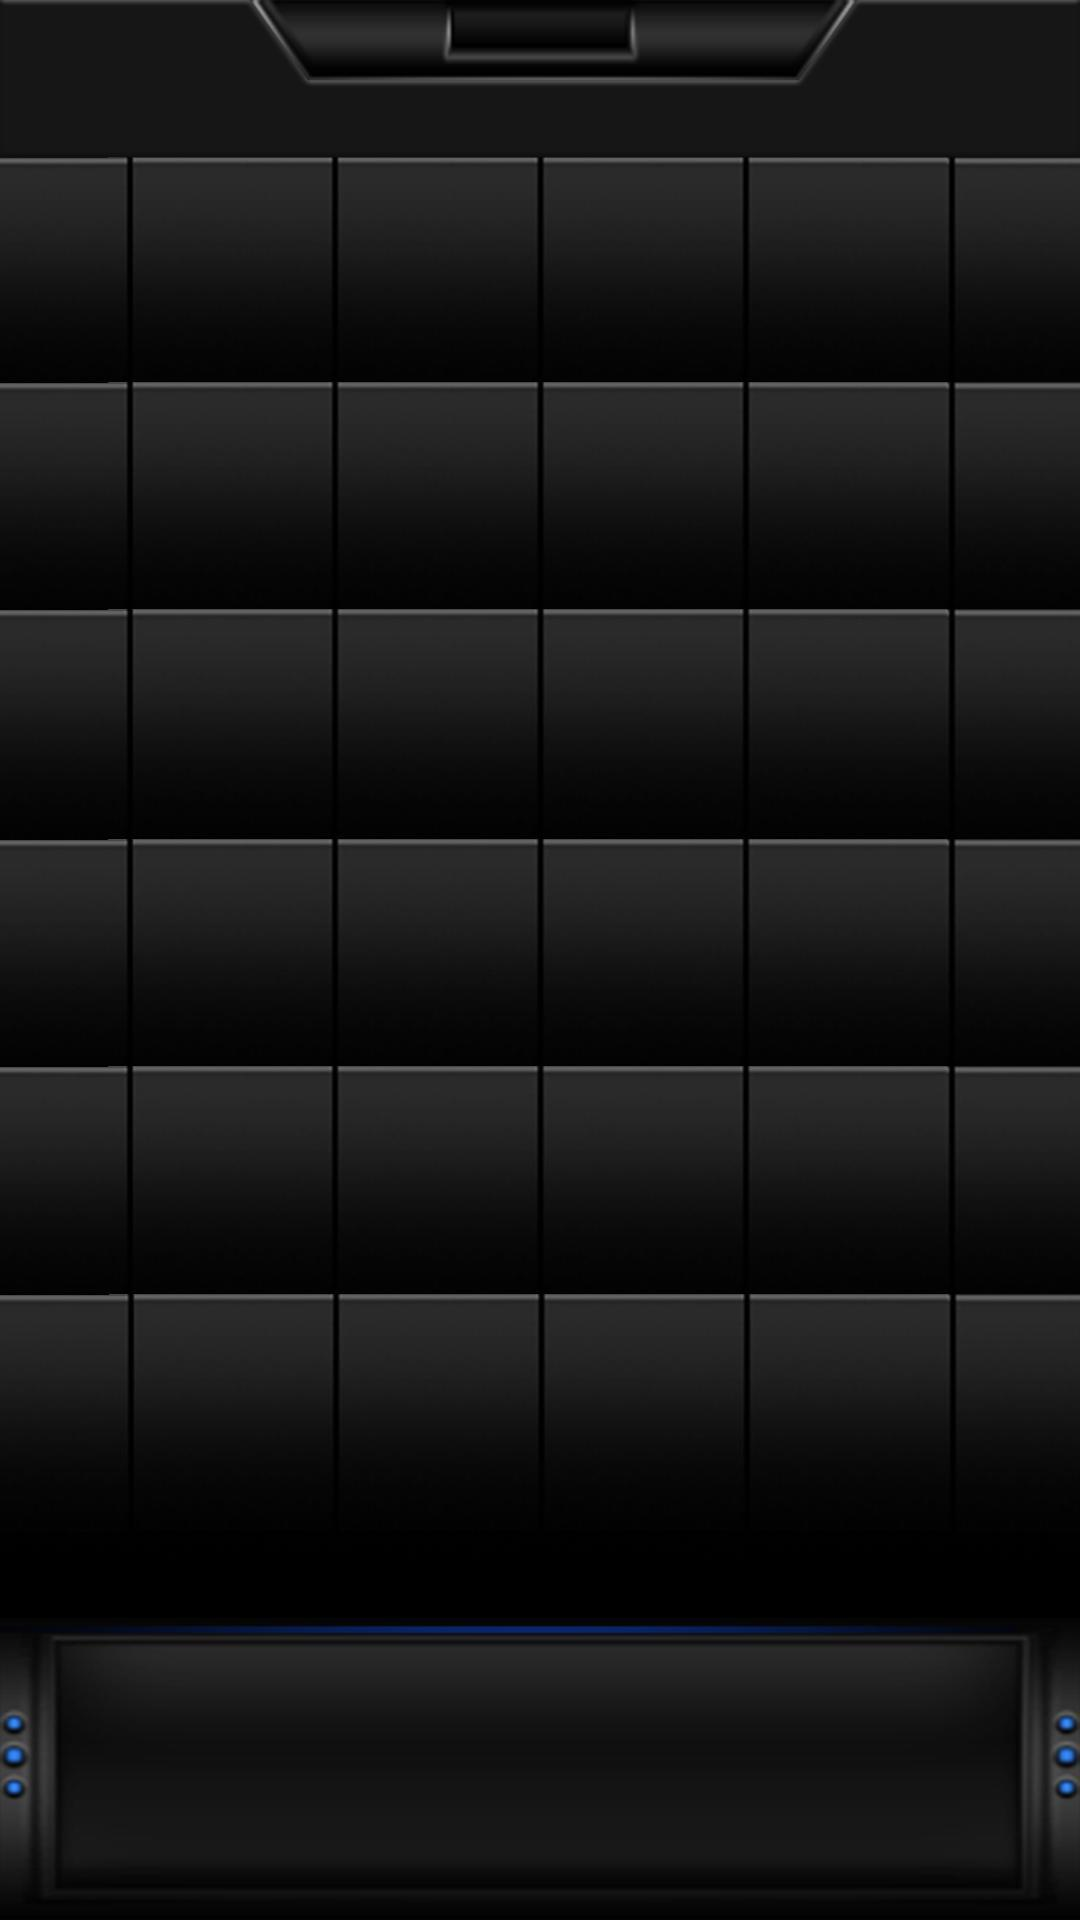 iPhone 7 Plus Wallpaper 1080x1920